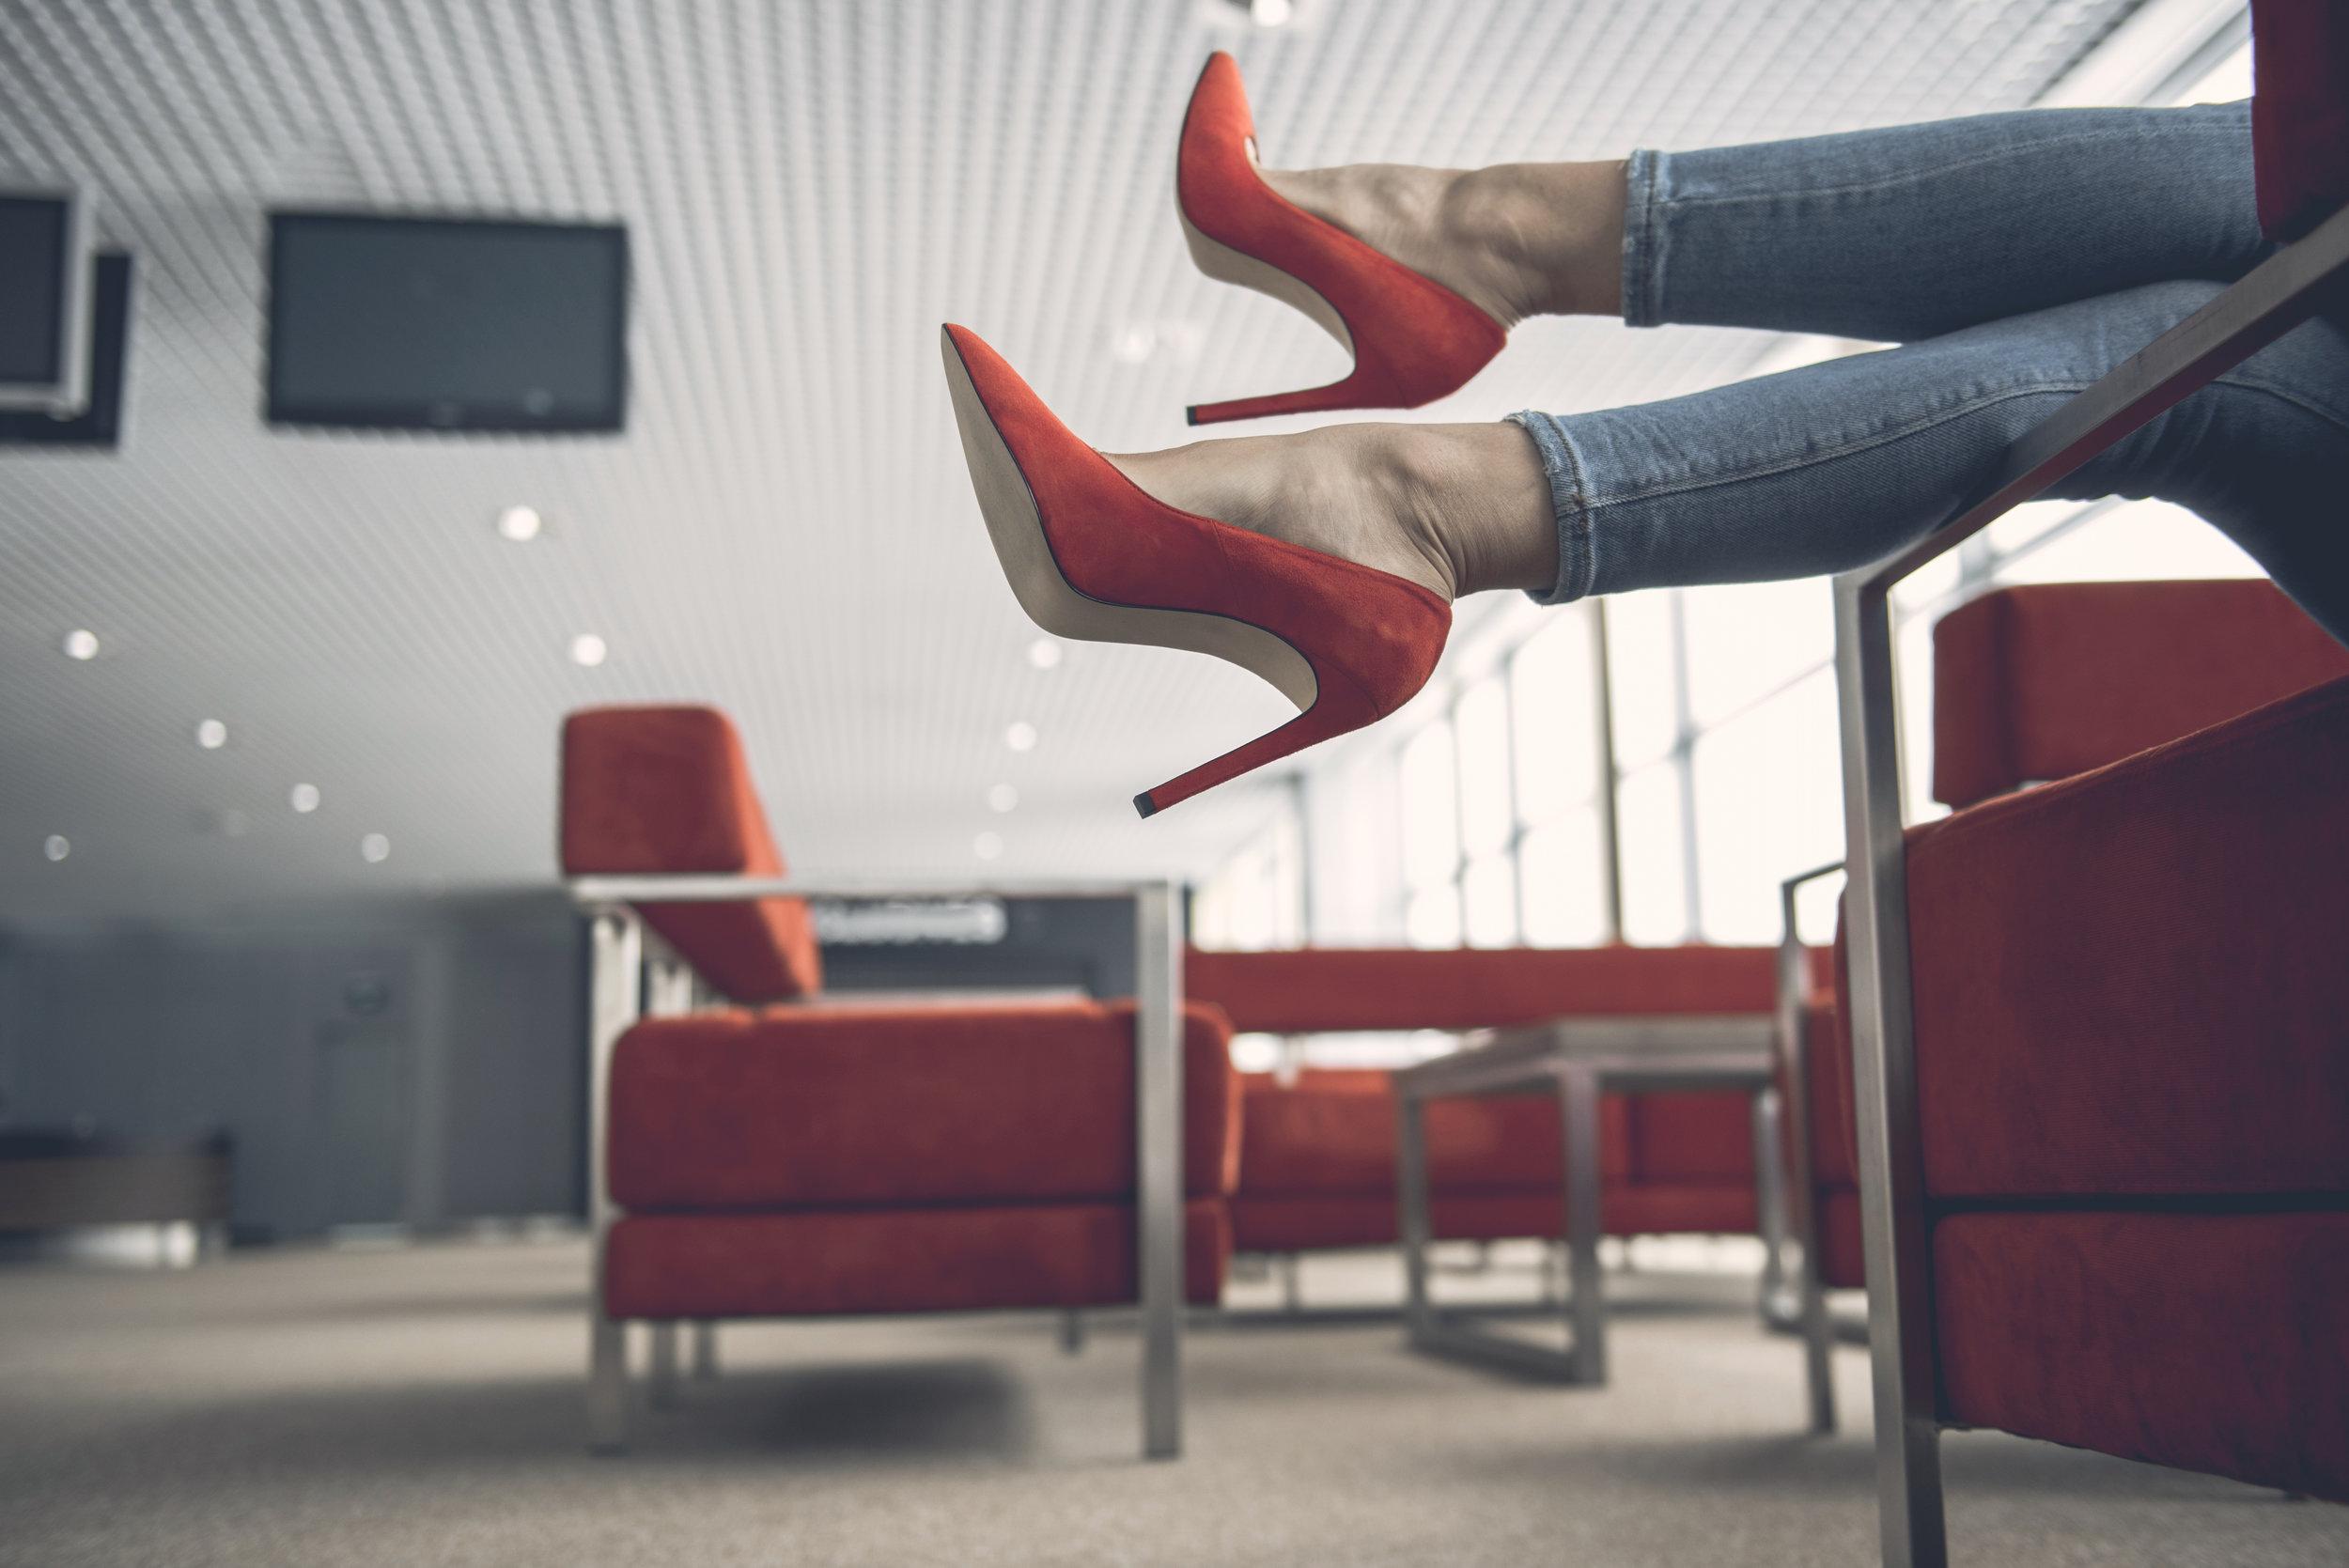 Woman-feet-locating-in-modern-lounge-zone-955686628_6016x4016.jpeg